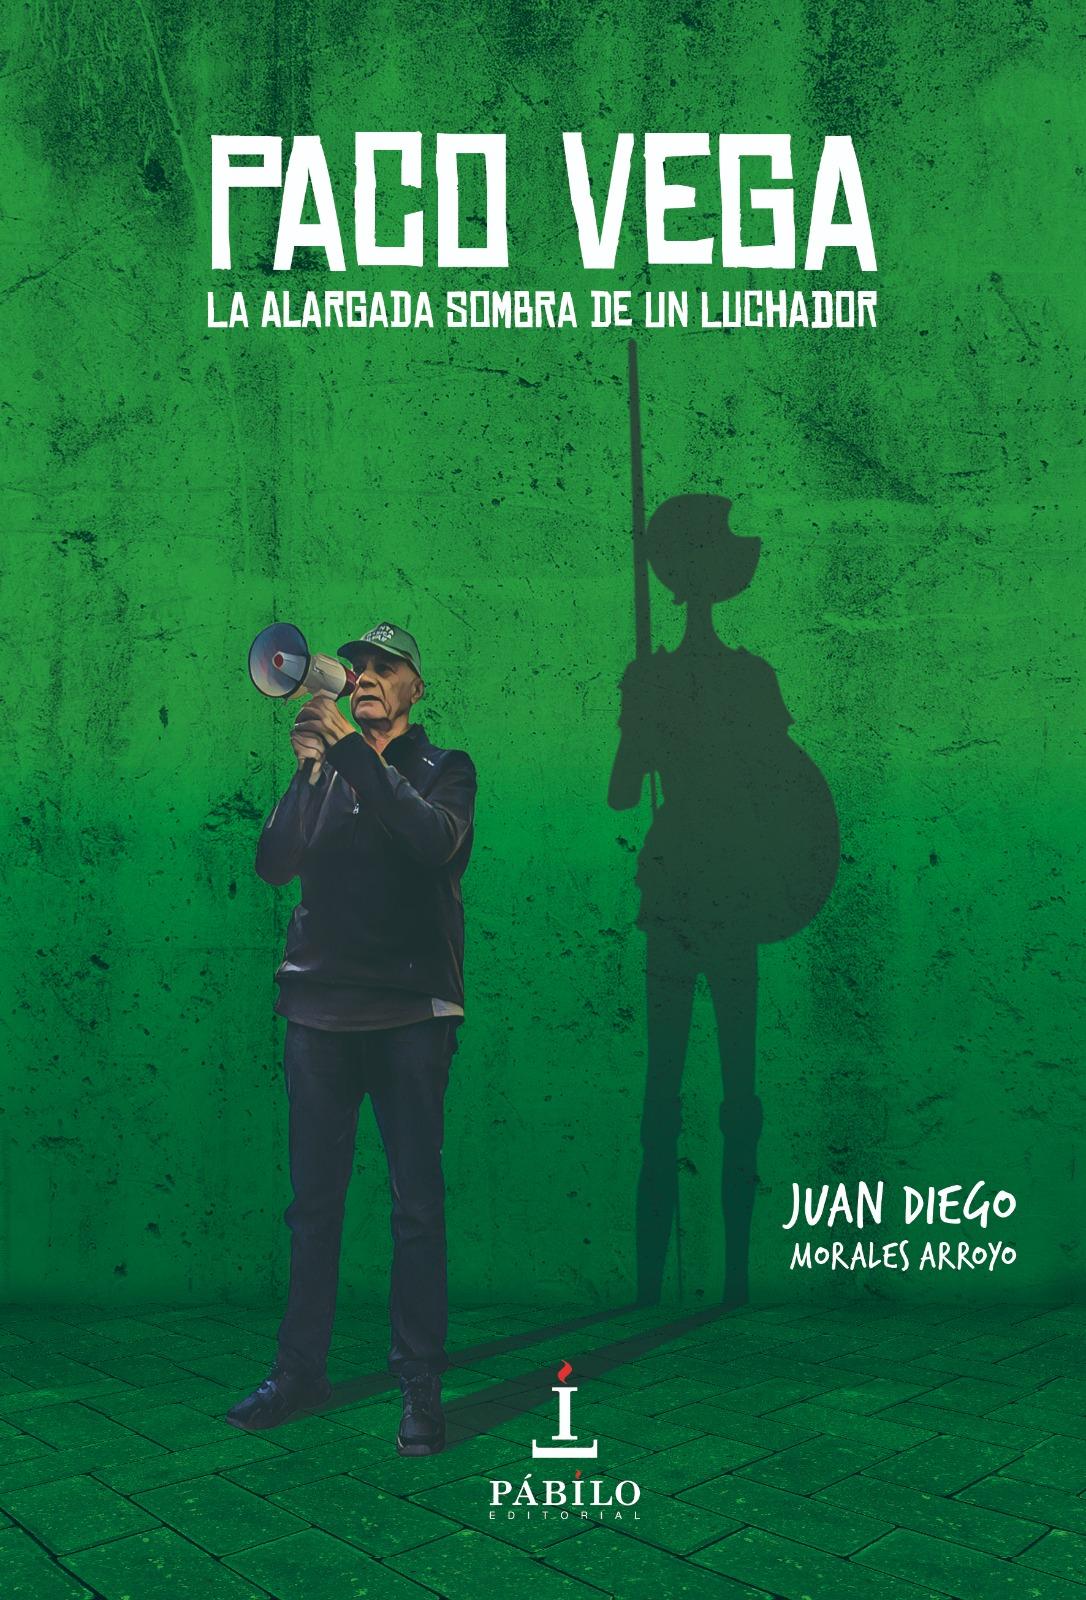 El periodista sevillano Juan Diego Morales narra la lucha del histórico activista Paco Vega